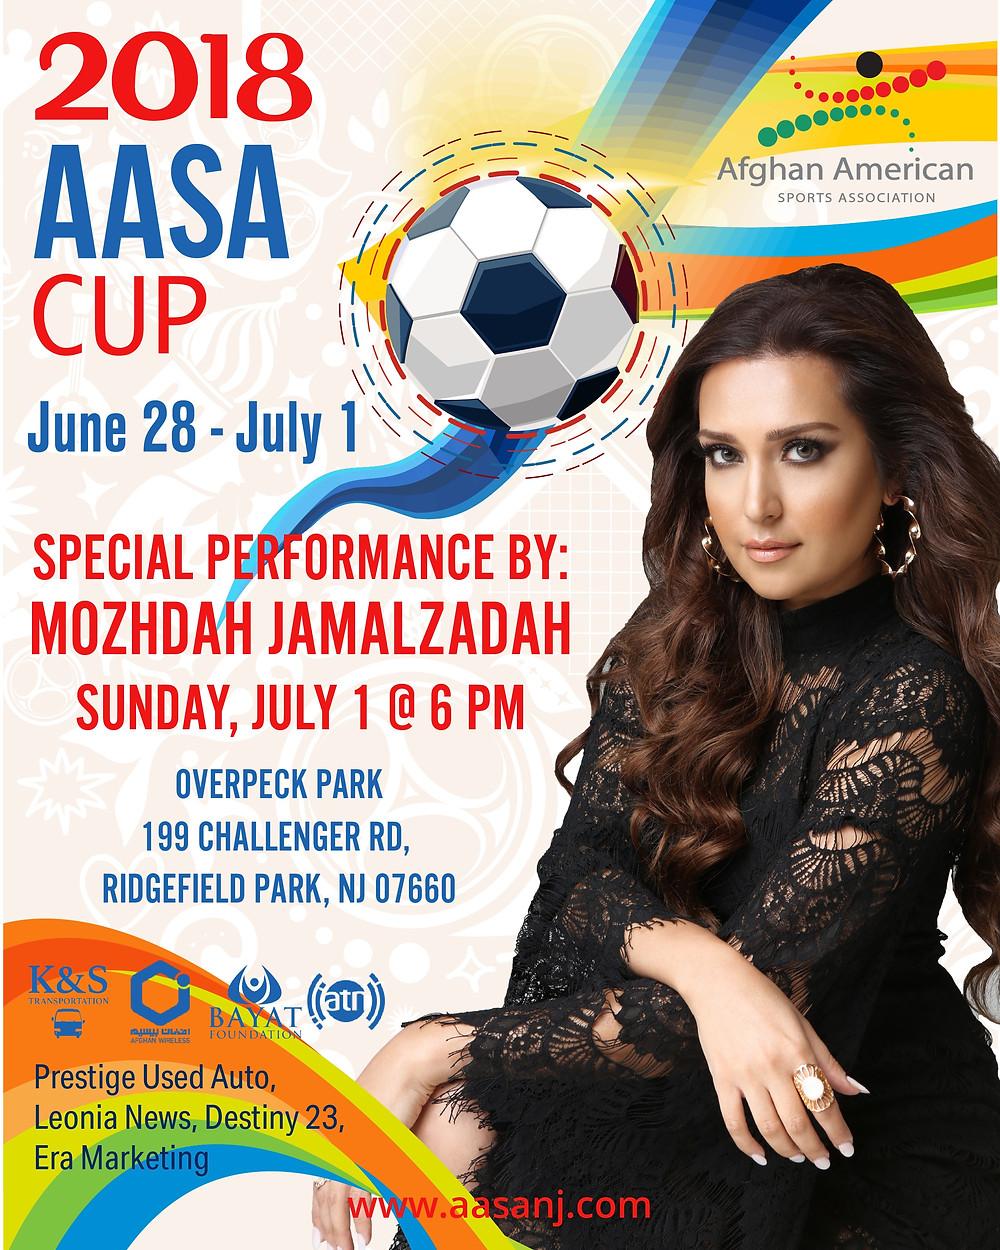 Mozhdah Jamalzadah 2018 AASA Cup Performance